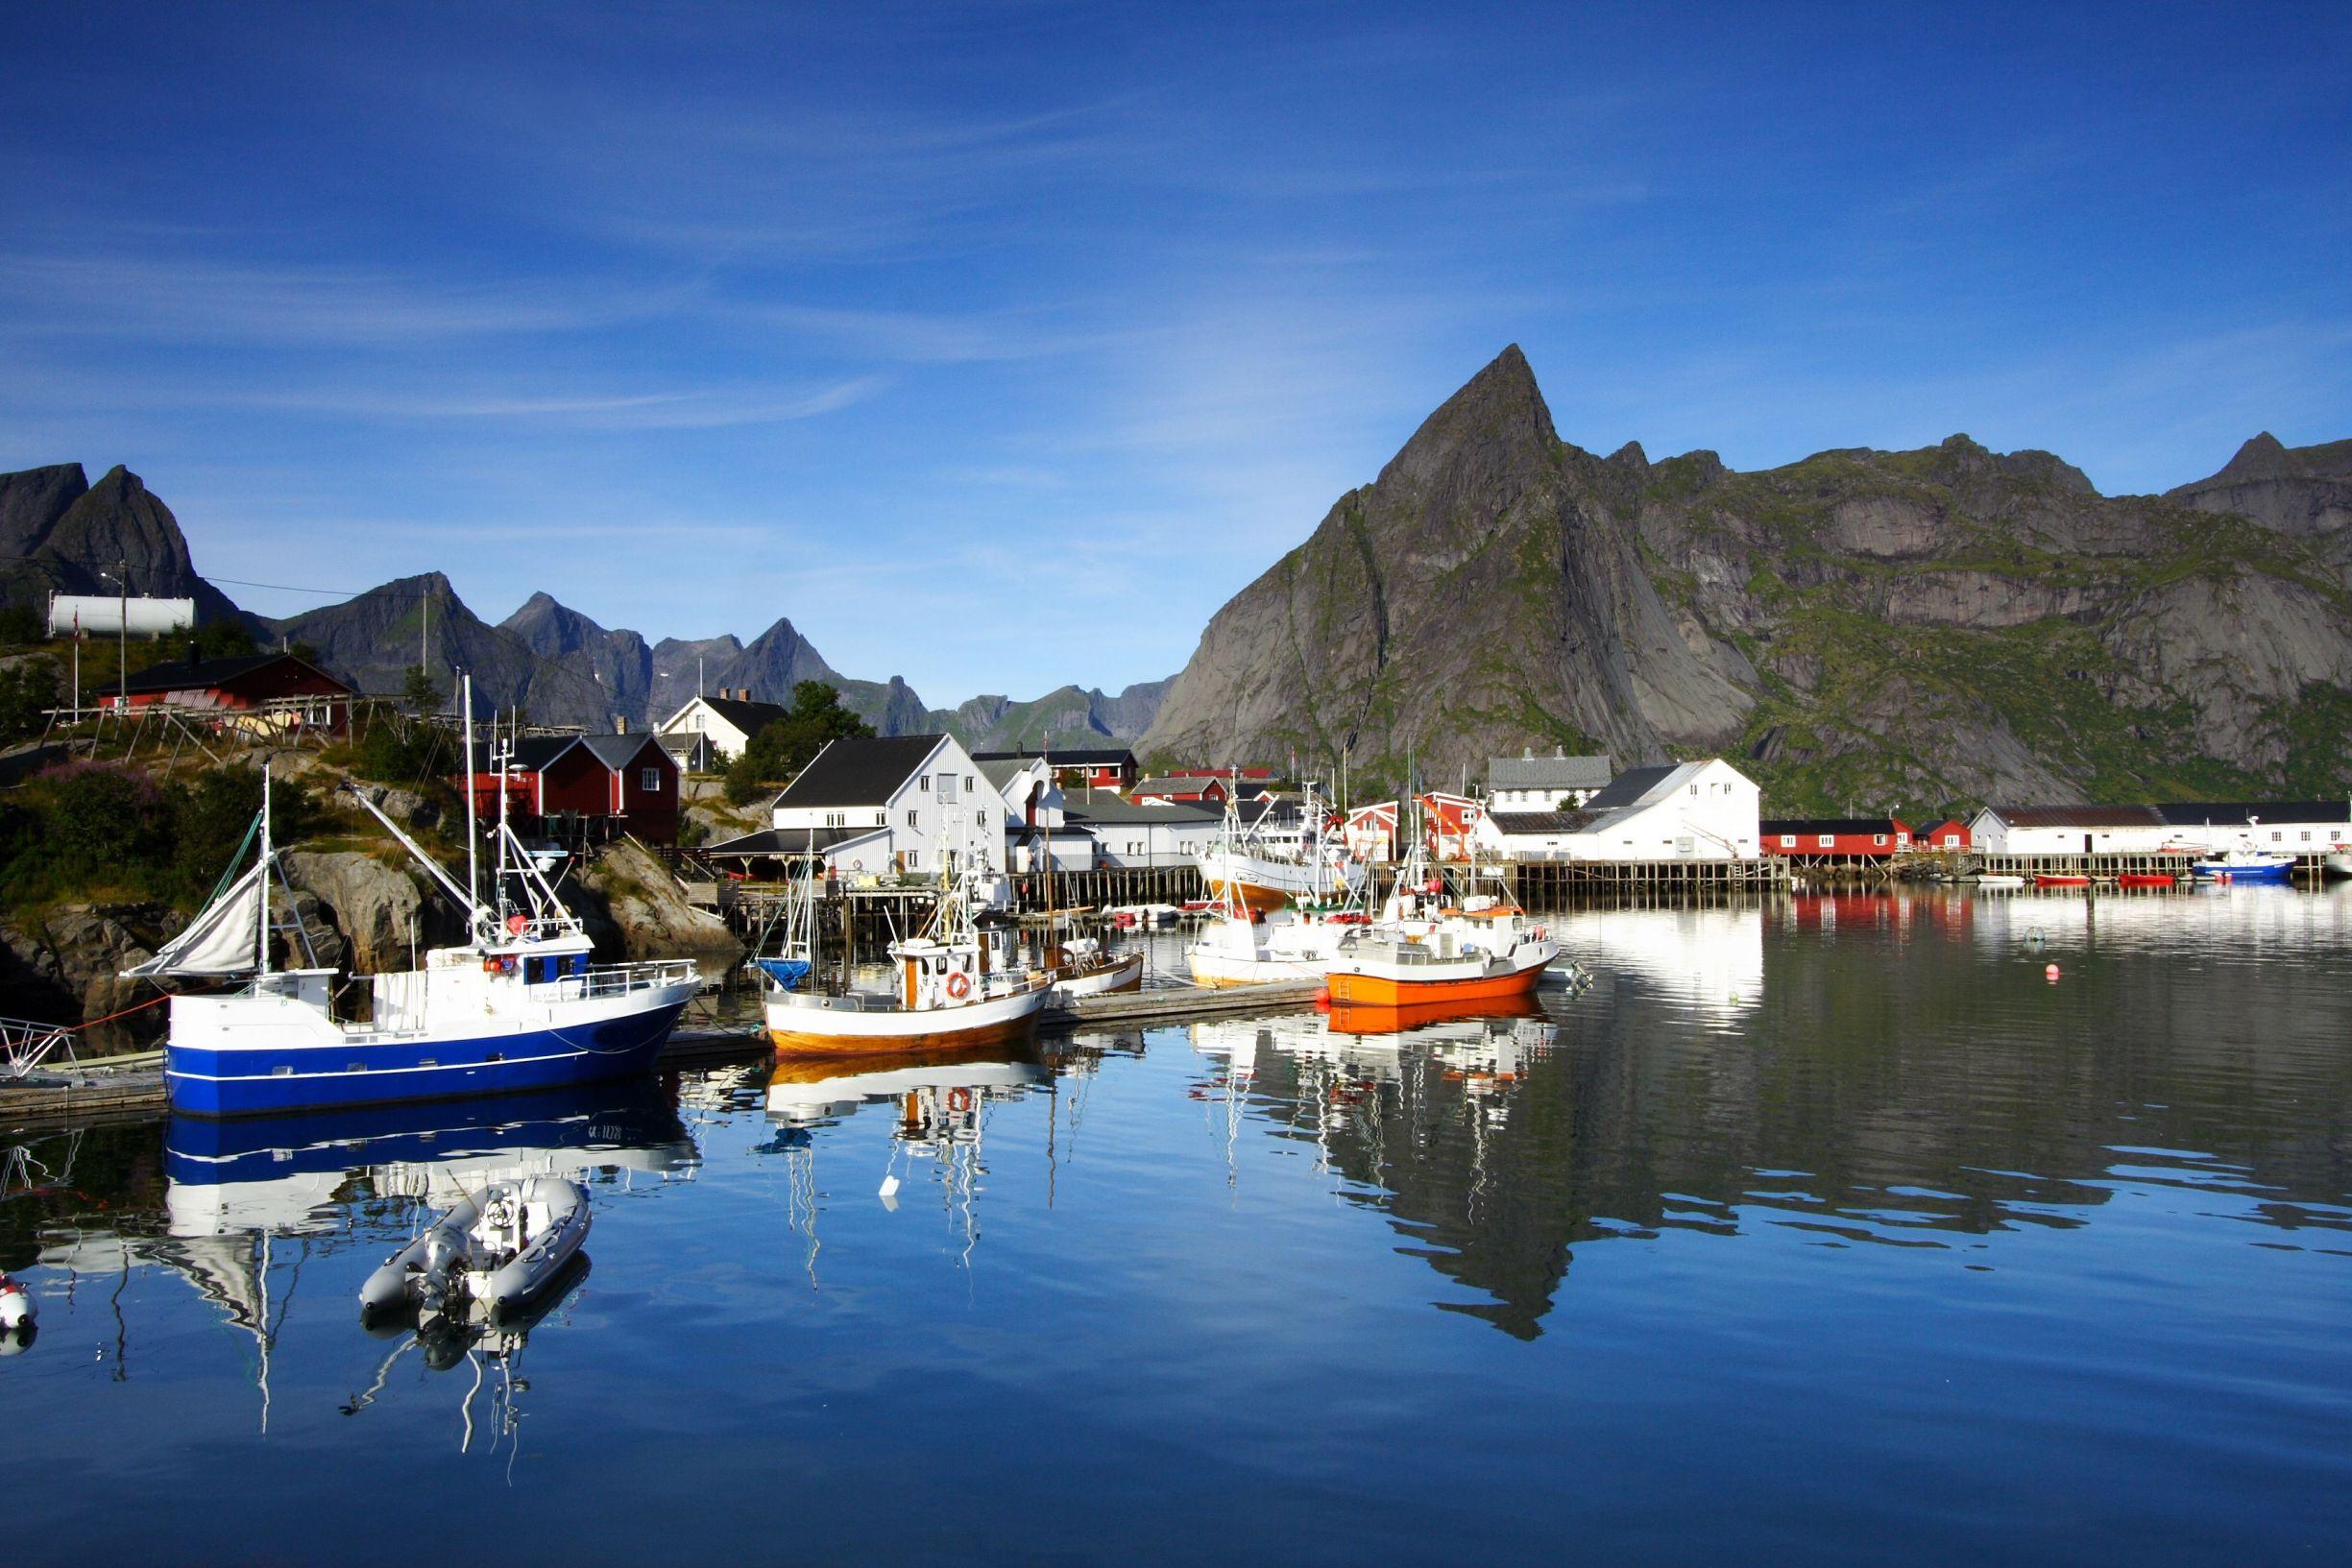 A port on the Lofoten islands, Norway